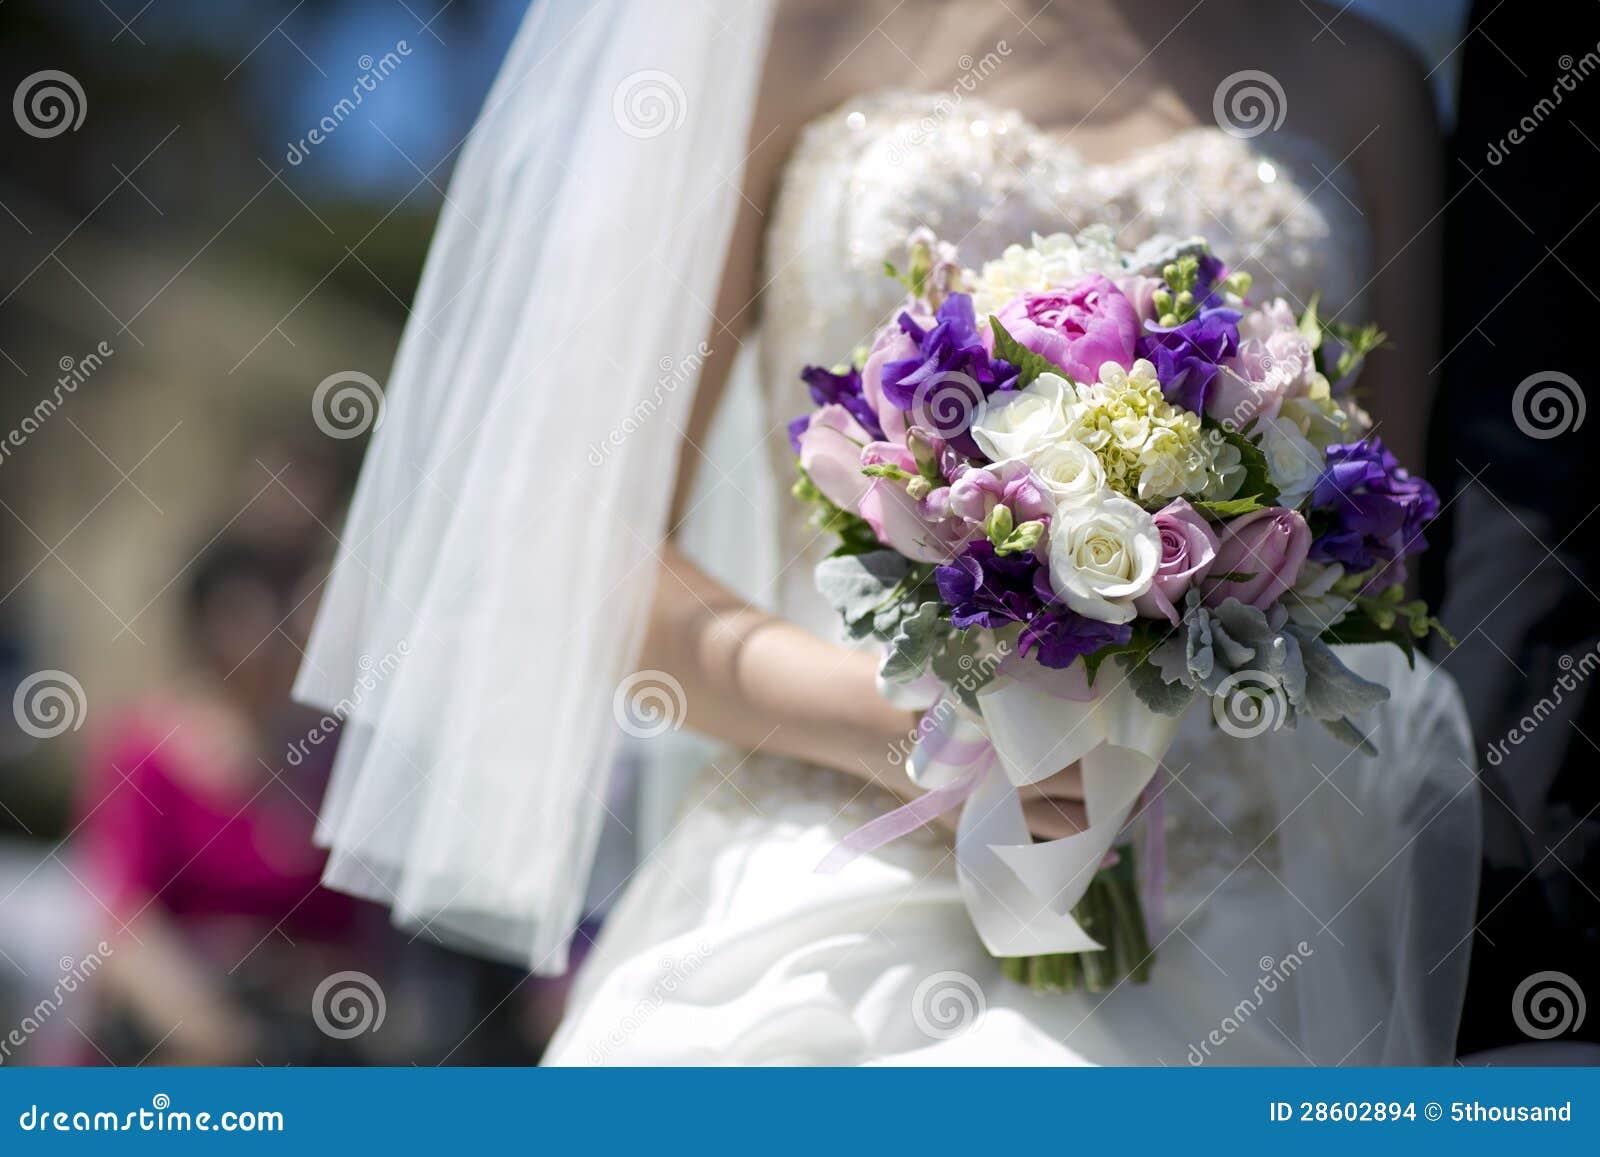 Purple White Vintage Wedding Bouquet Stock Photo - Image of flower ...